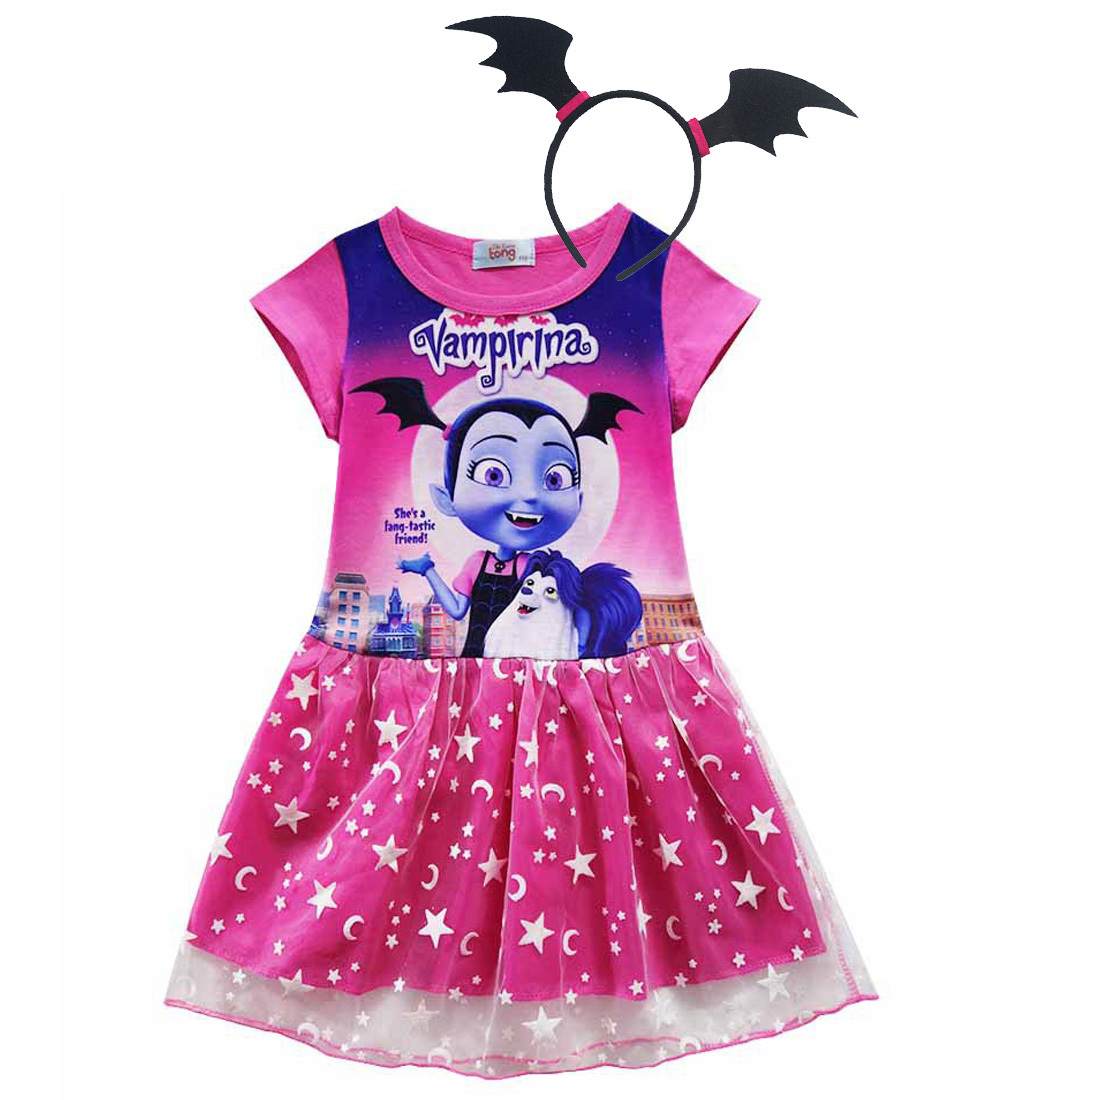 3-10Y Girls Dress Summer Fashion Vampire Kids Dress Princess Vampirin Children Dresses Print Girls Clothes Halloween Costume